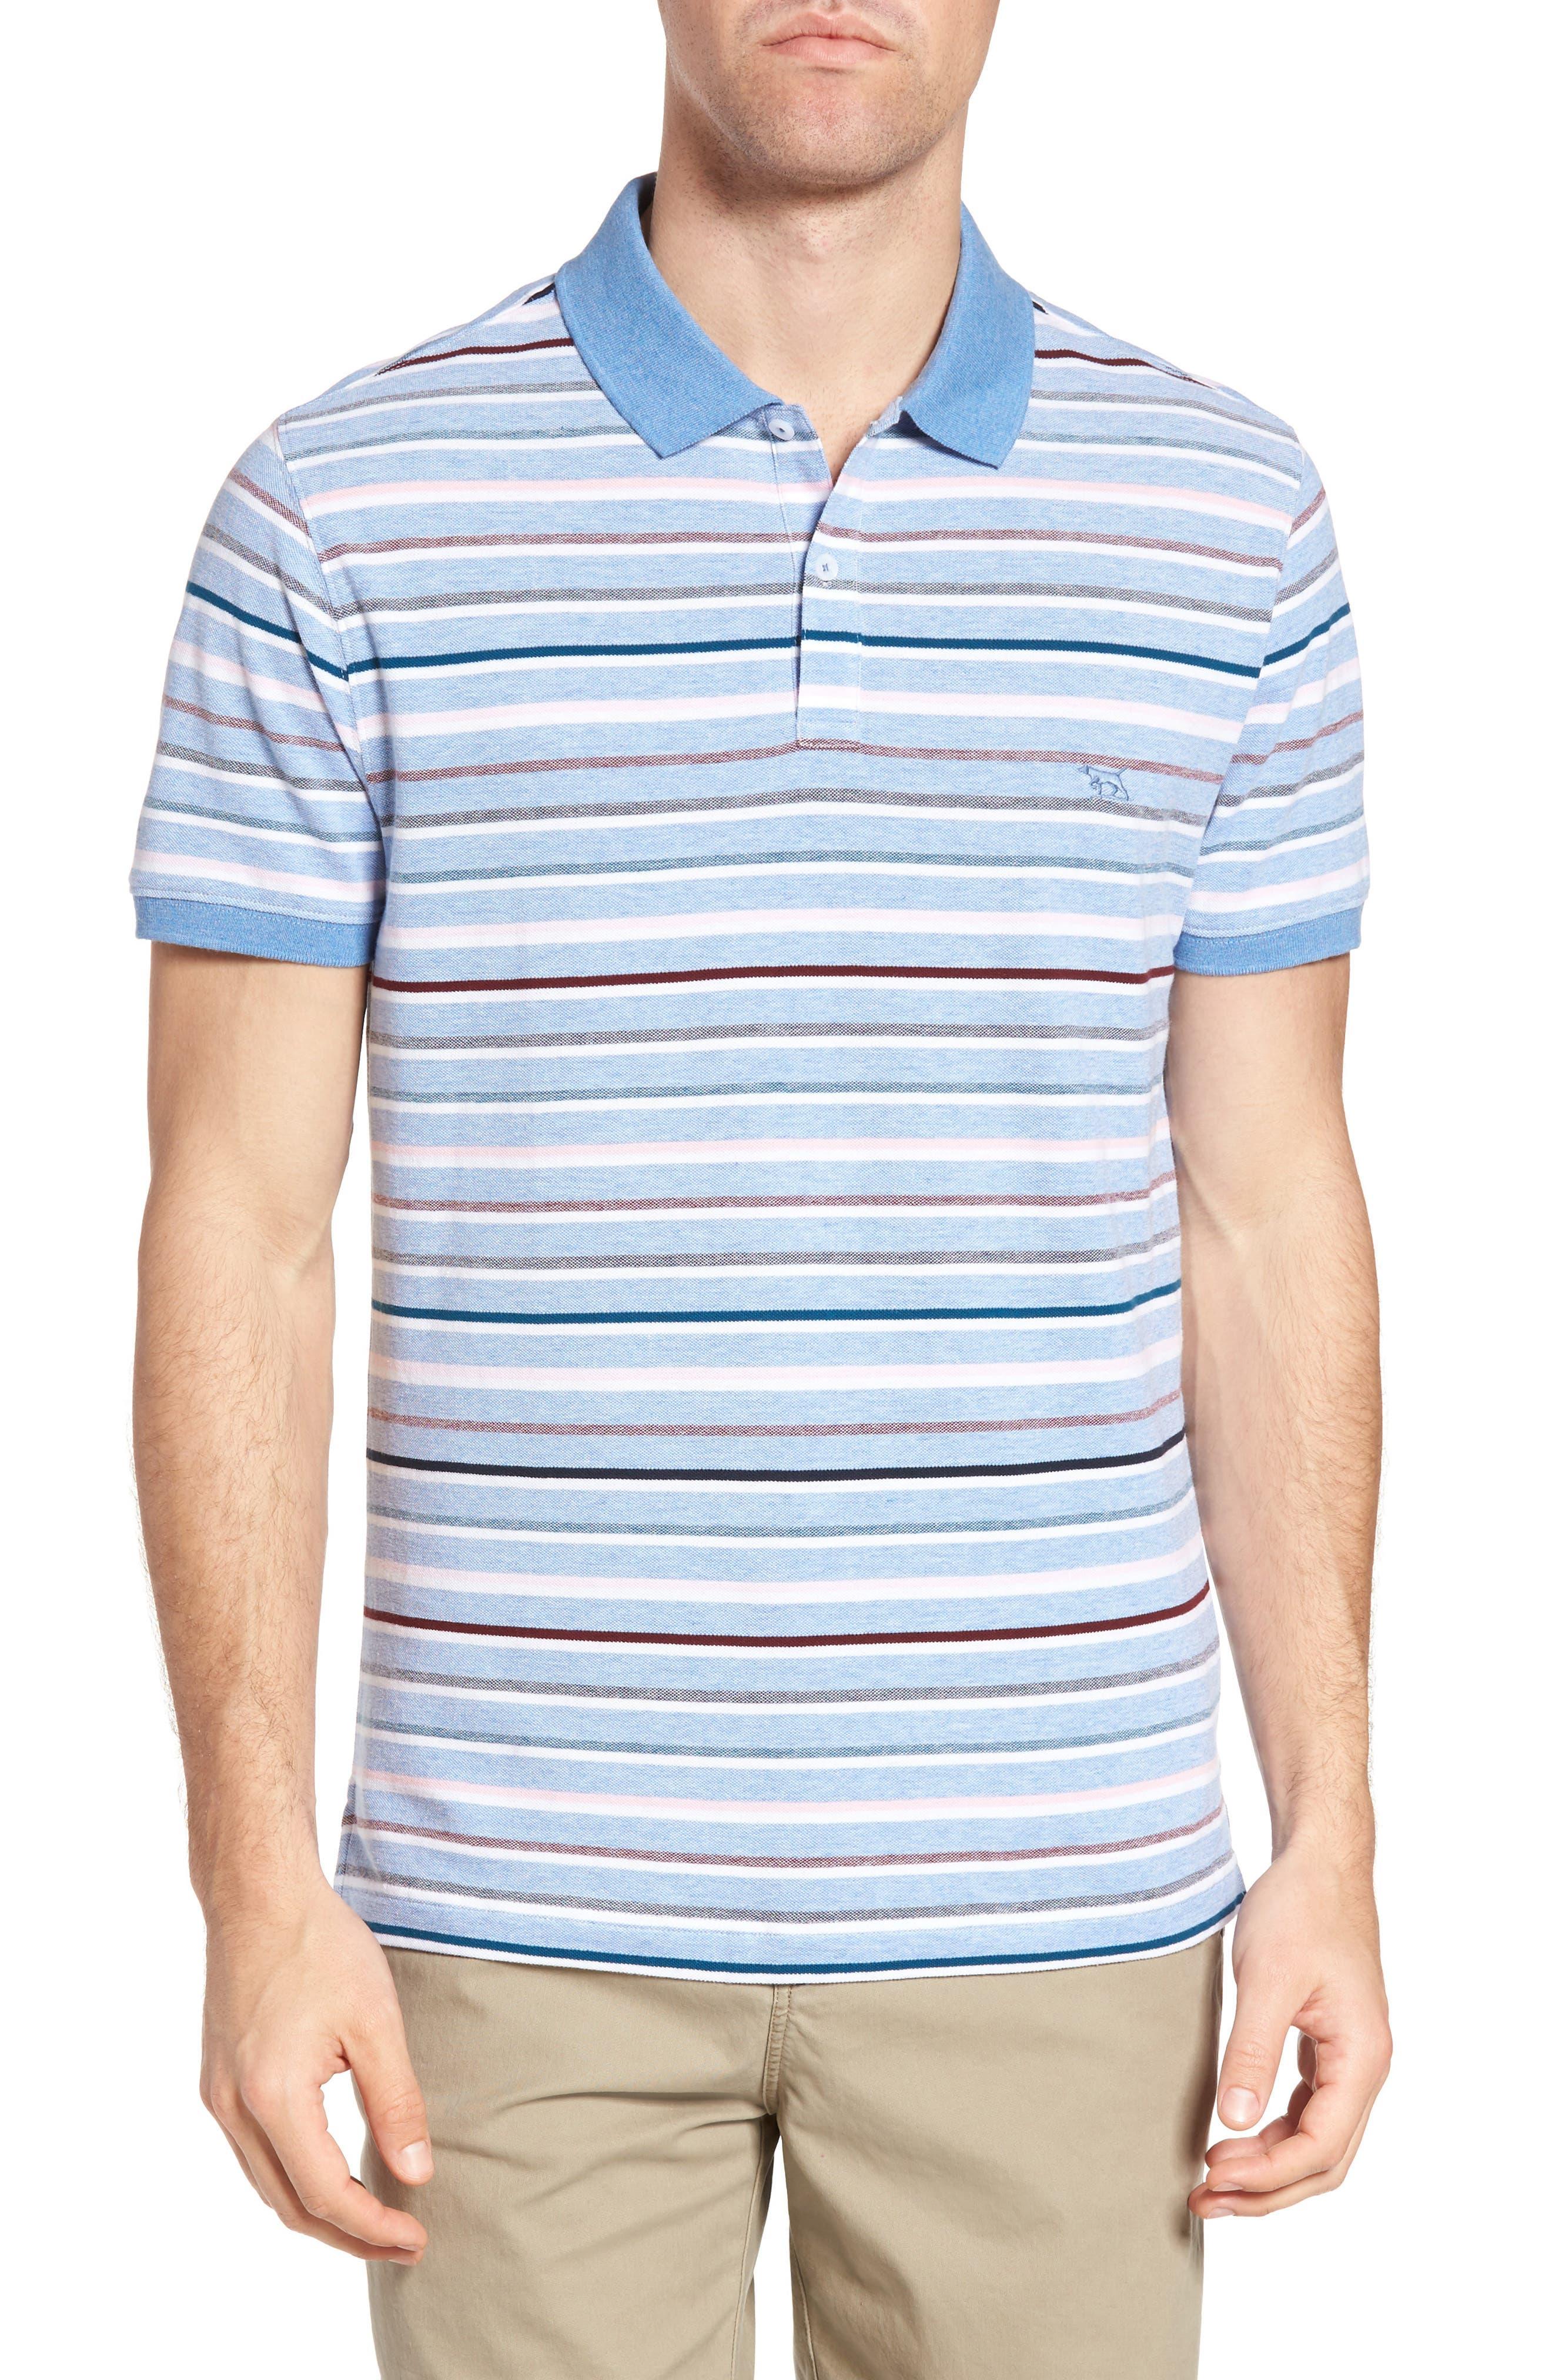 Gowan Hill Sports Fit Cotton Polo,                         Main,                         color, 457